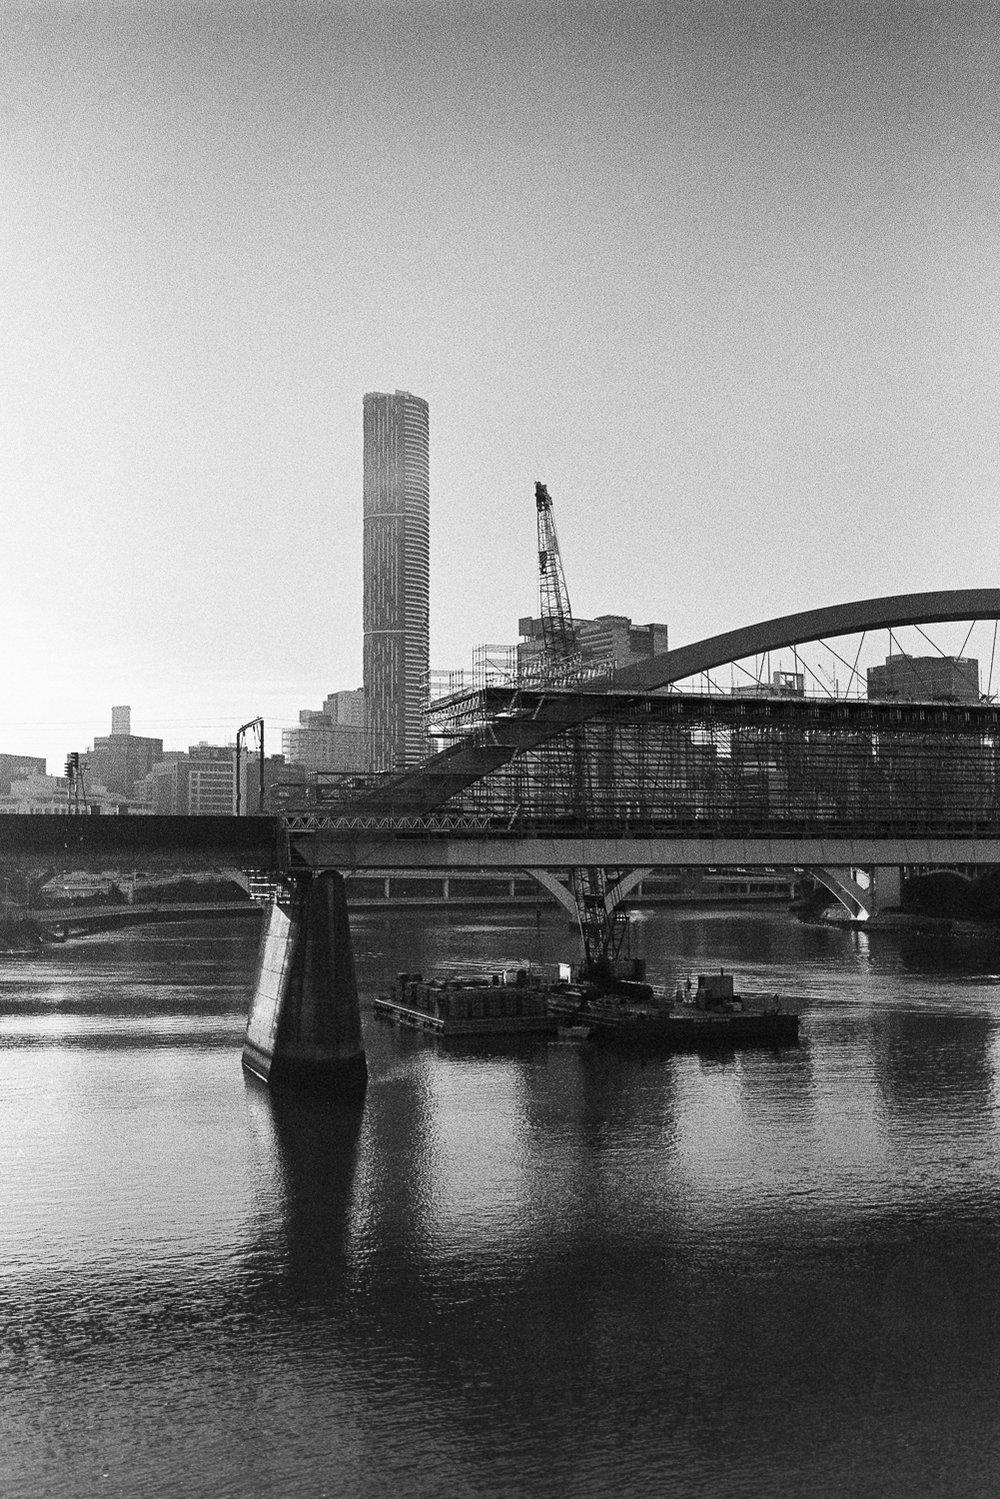 The Merivale Rail Bridge once again.